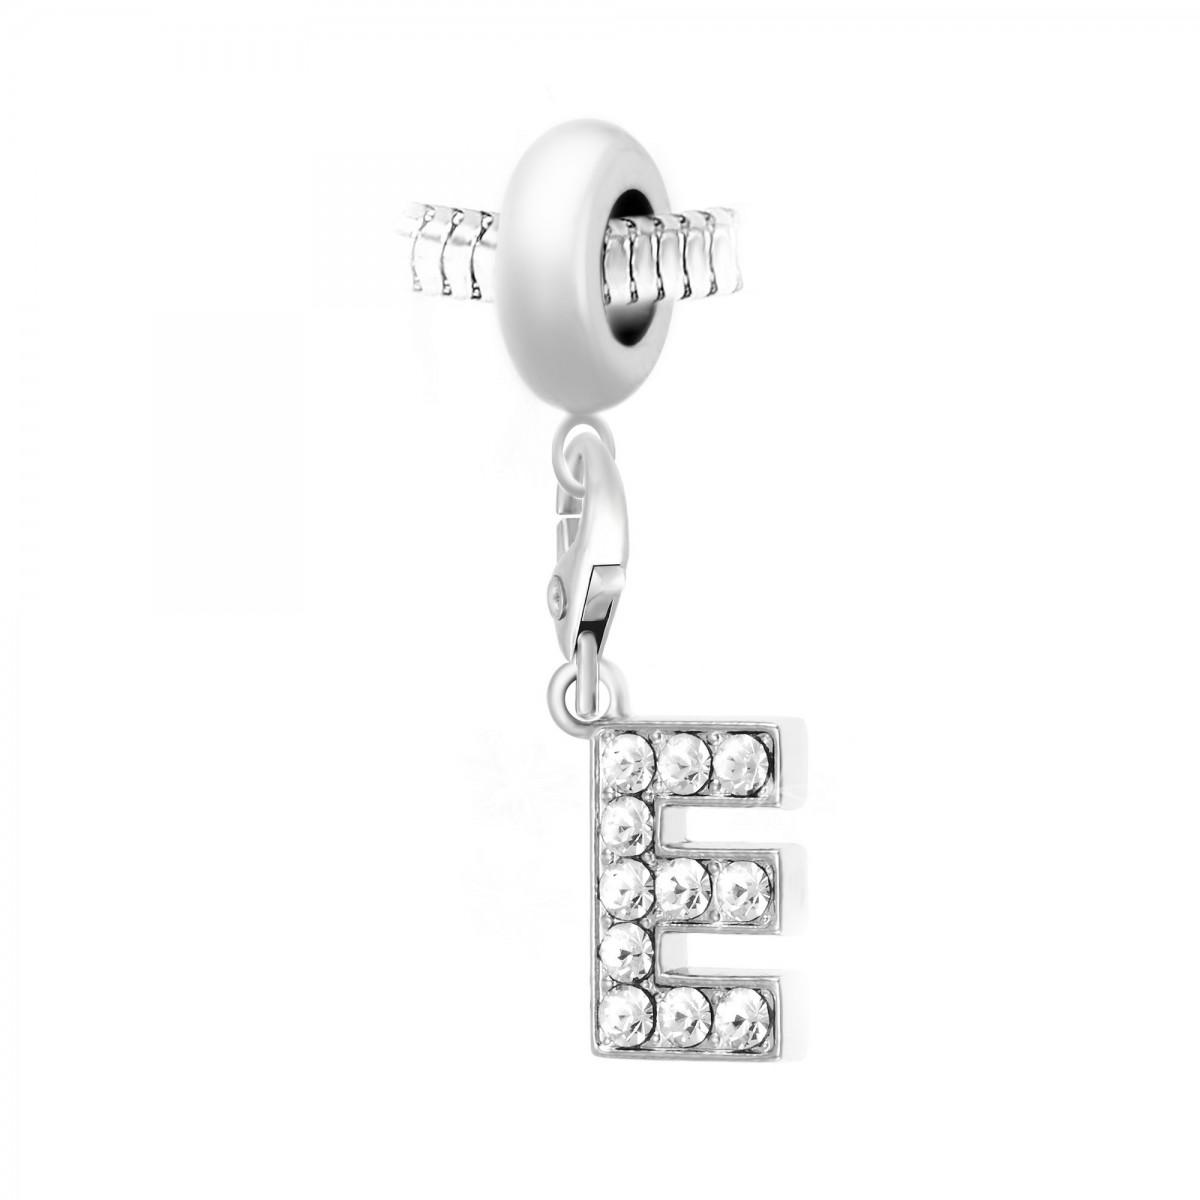 Charm perle So Charm en acier avec pendentif lettre E made with crystal from Swarovski